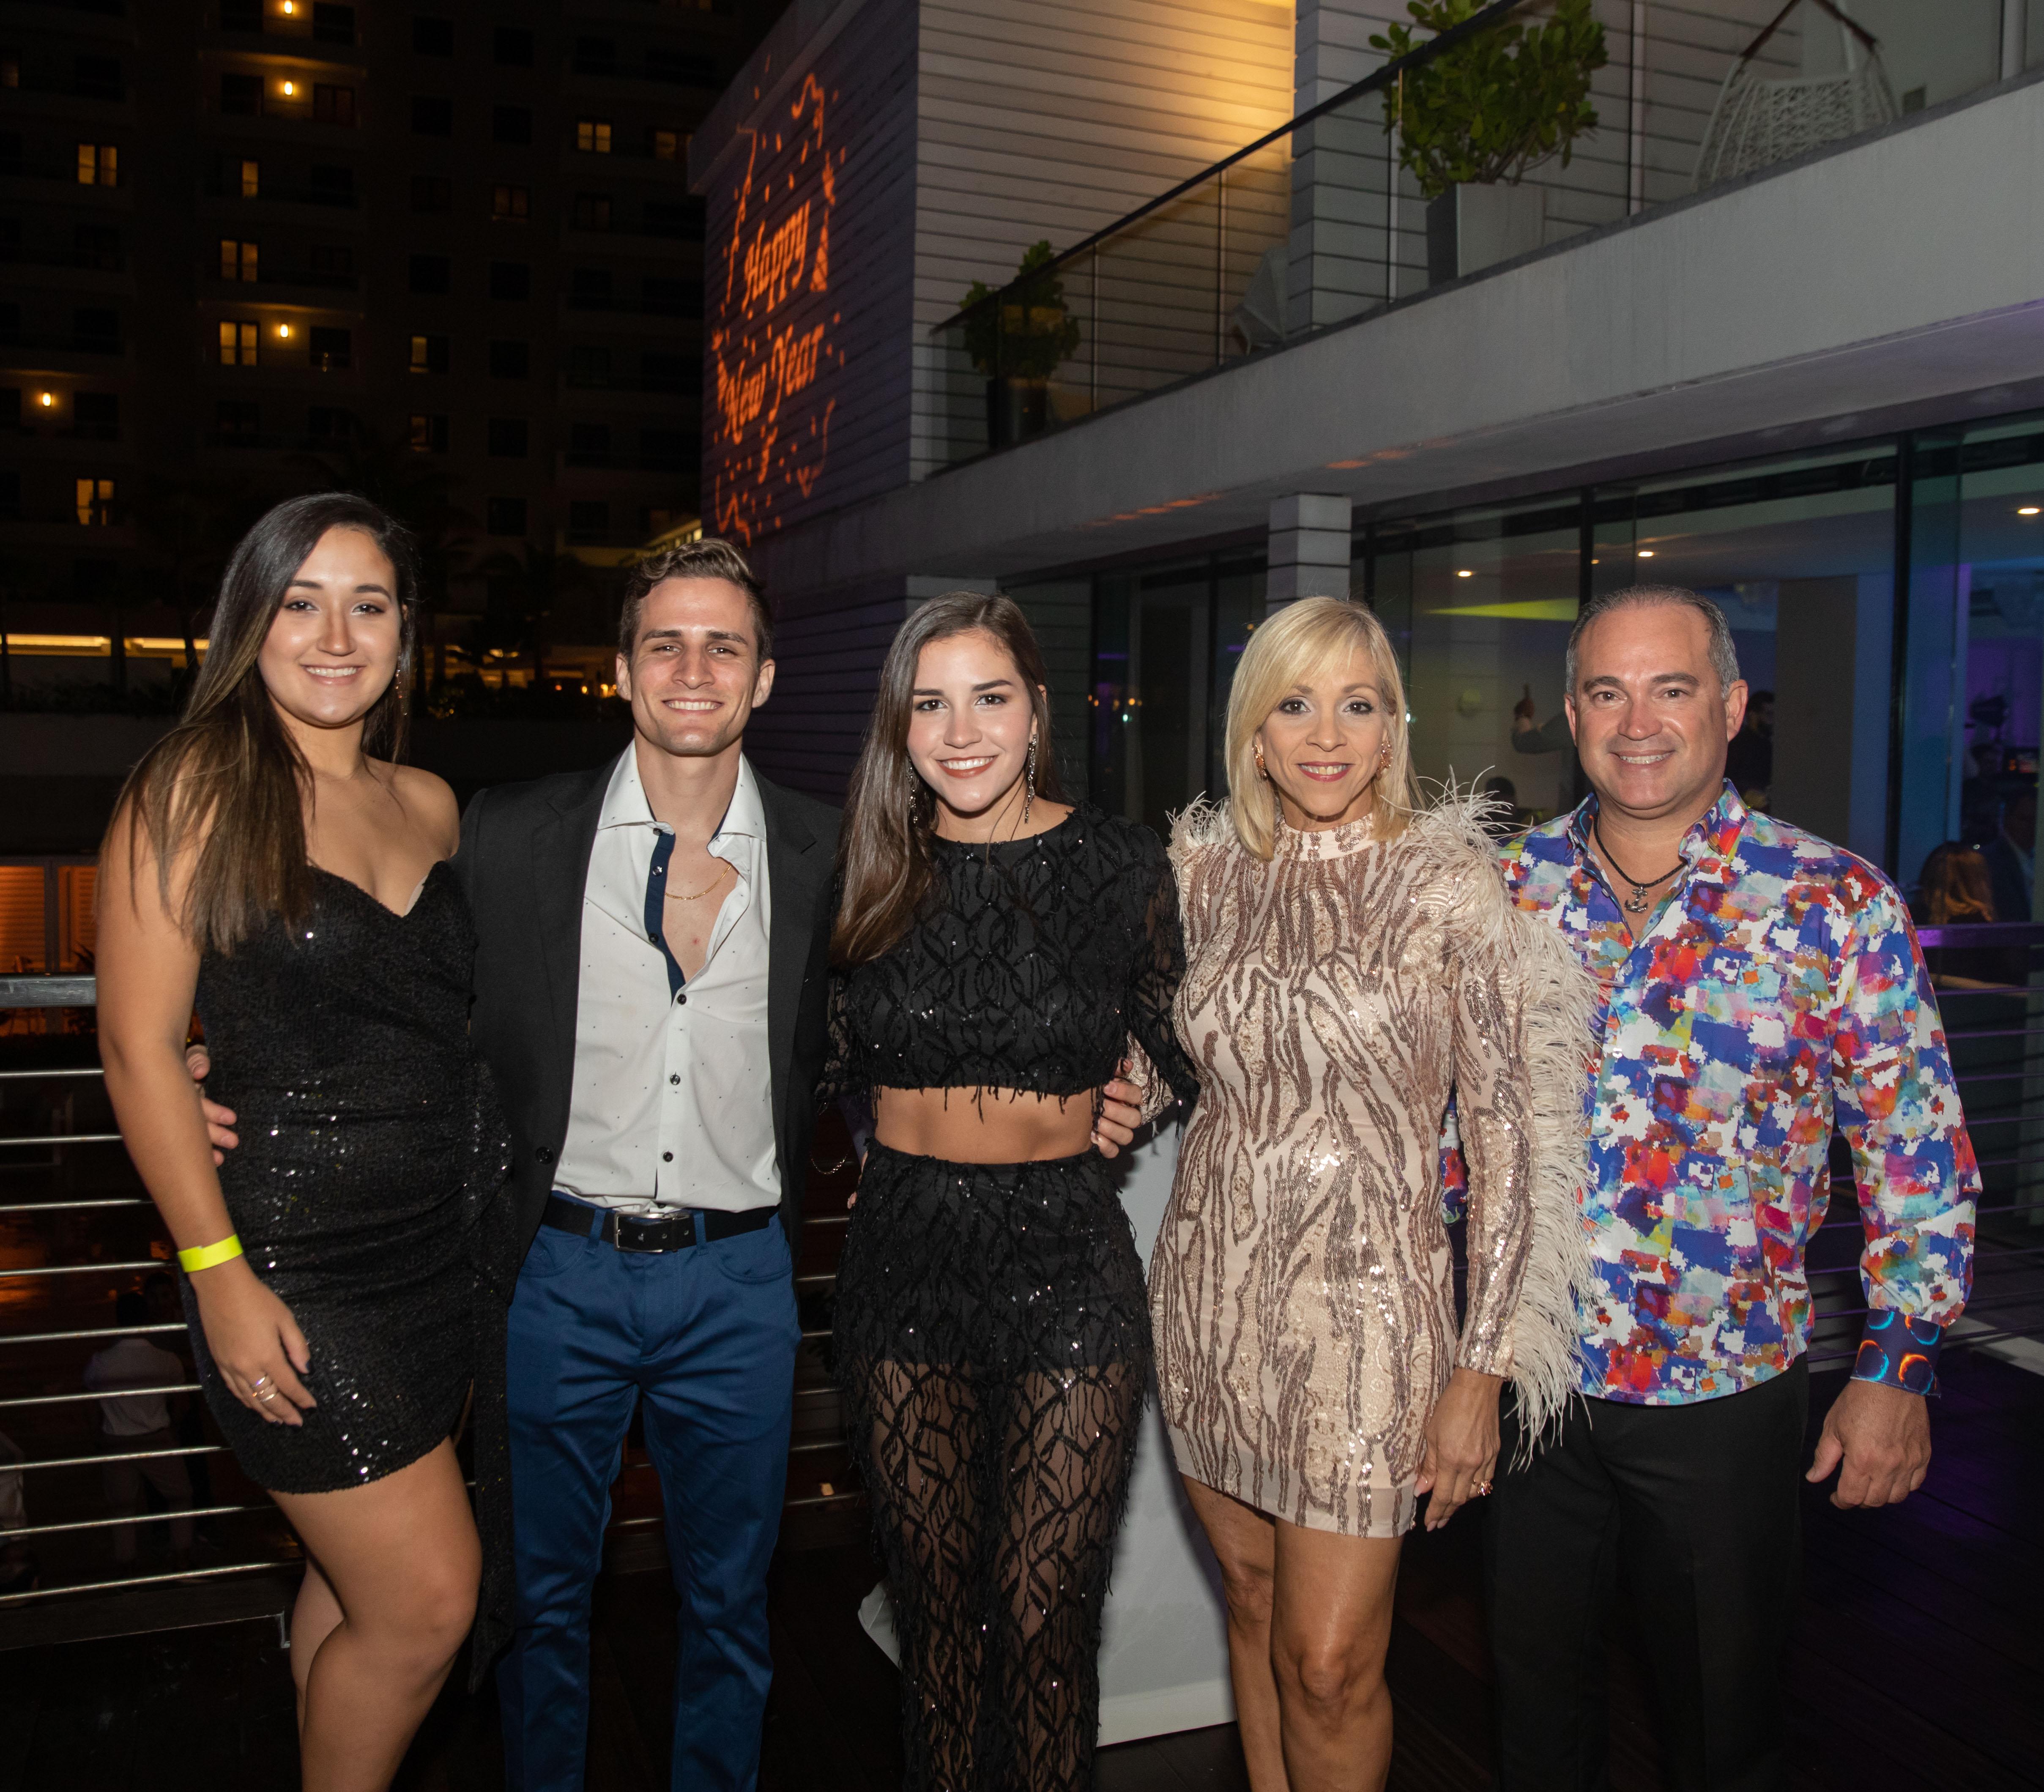 Pamela Cancel, Kevin Ceballos, Krystell Ceballos, Elaine Alvarez y Xavier Torres. (Suministrada)